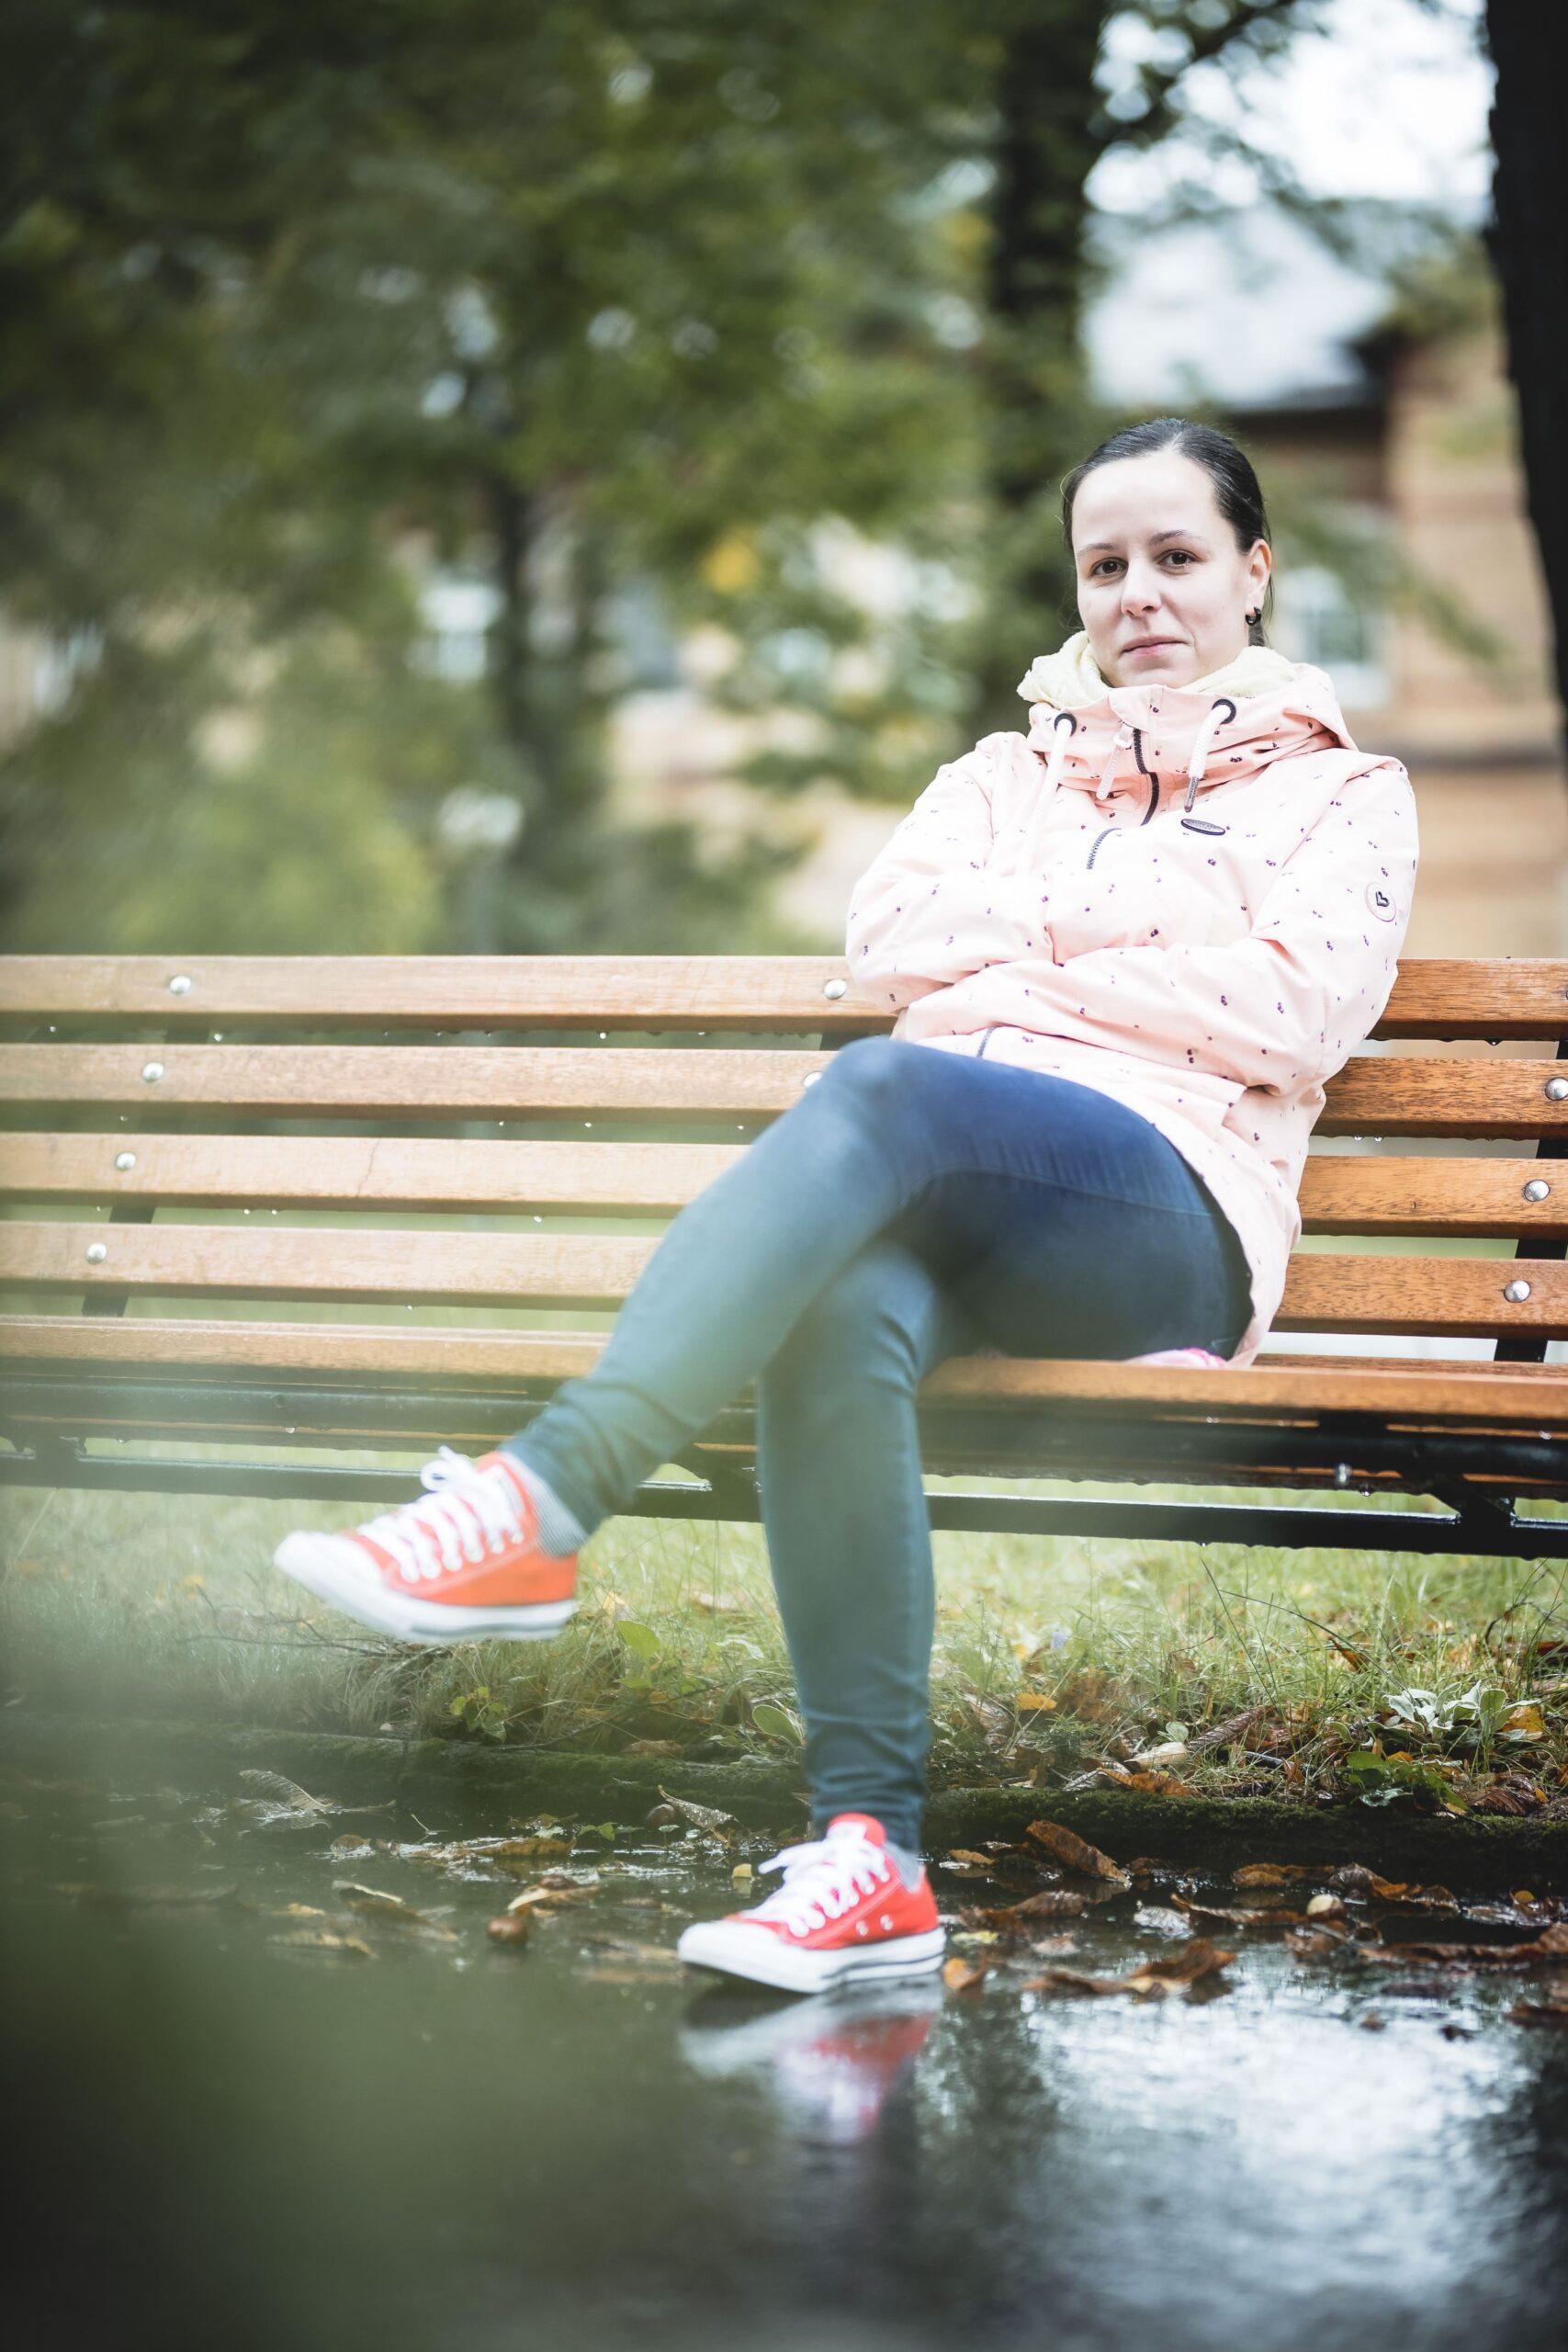 Kristin Cseresznye Über mich virtuelle Assistentin Social Media